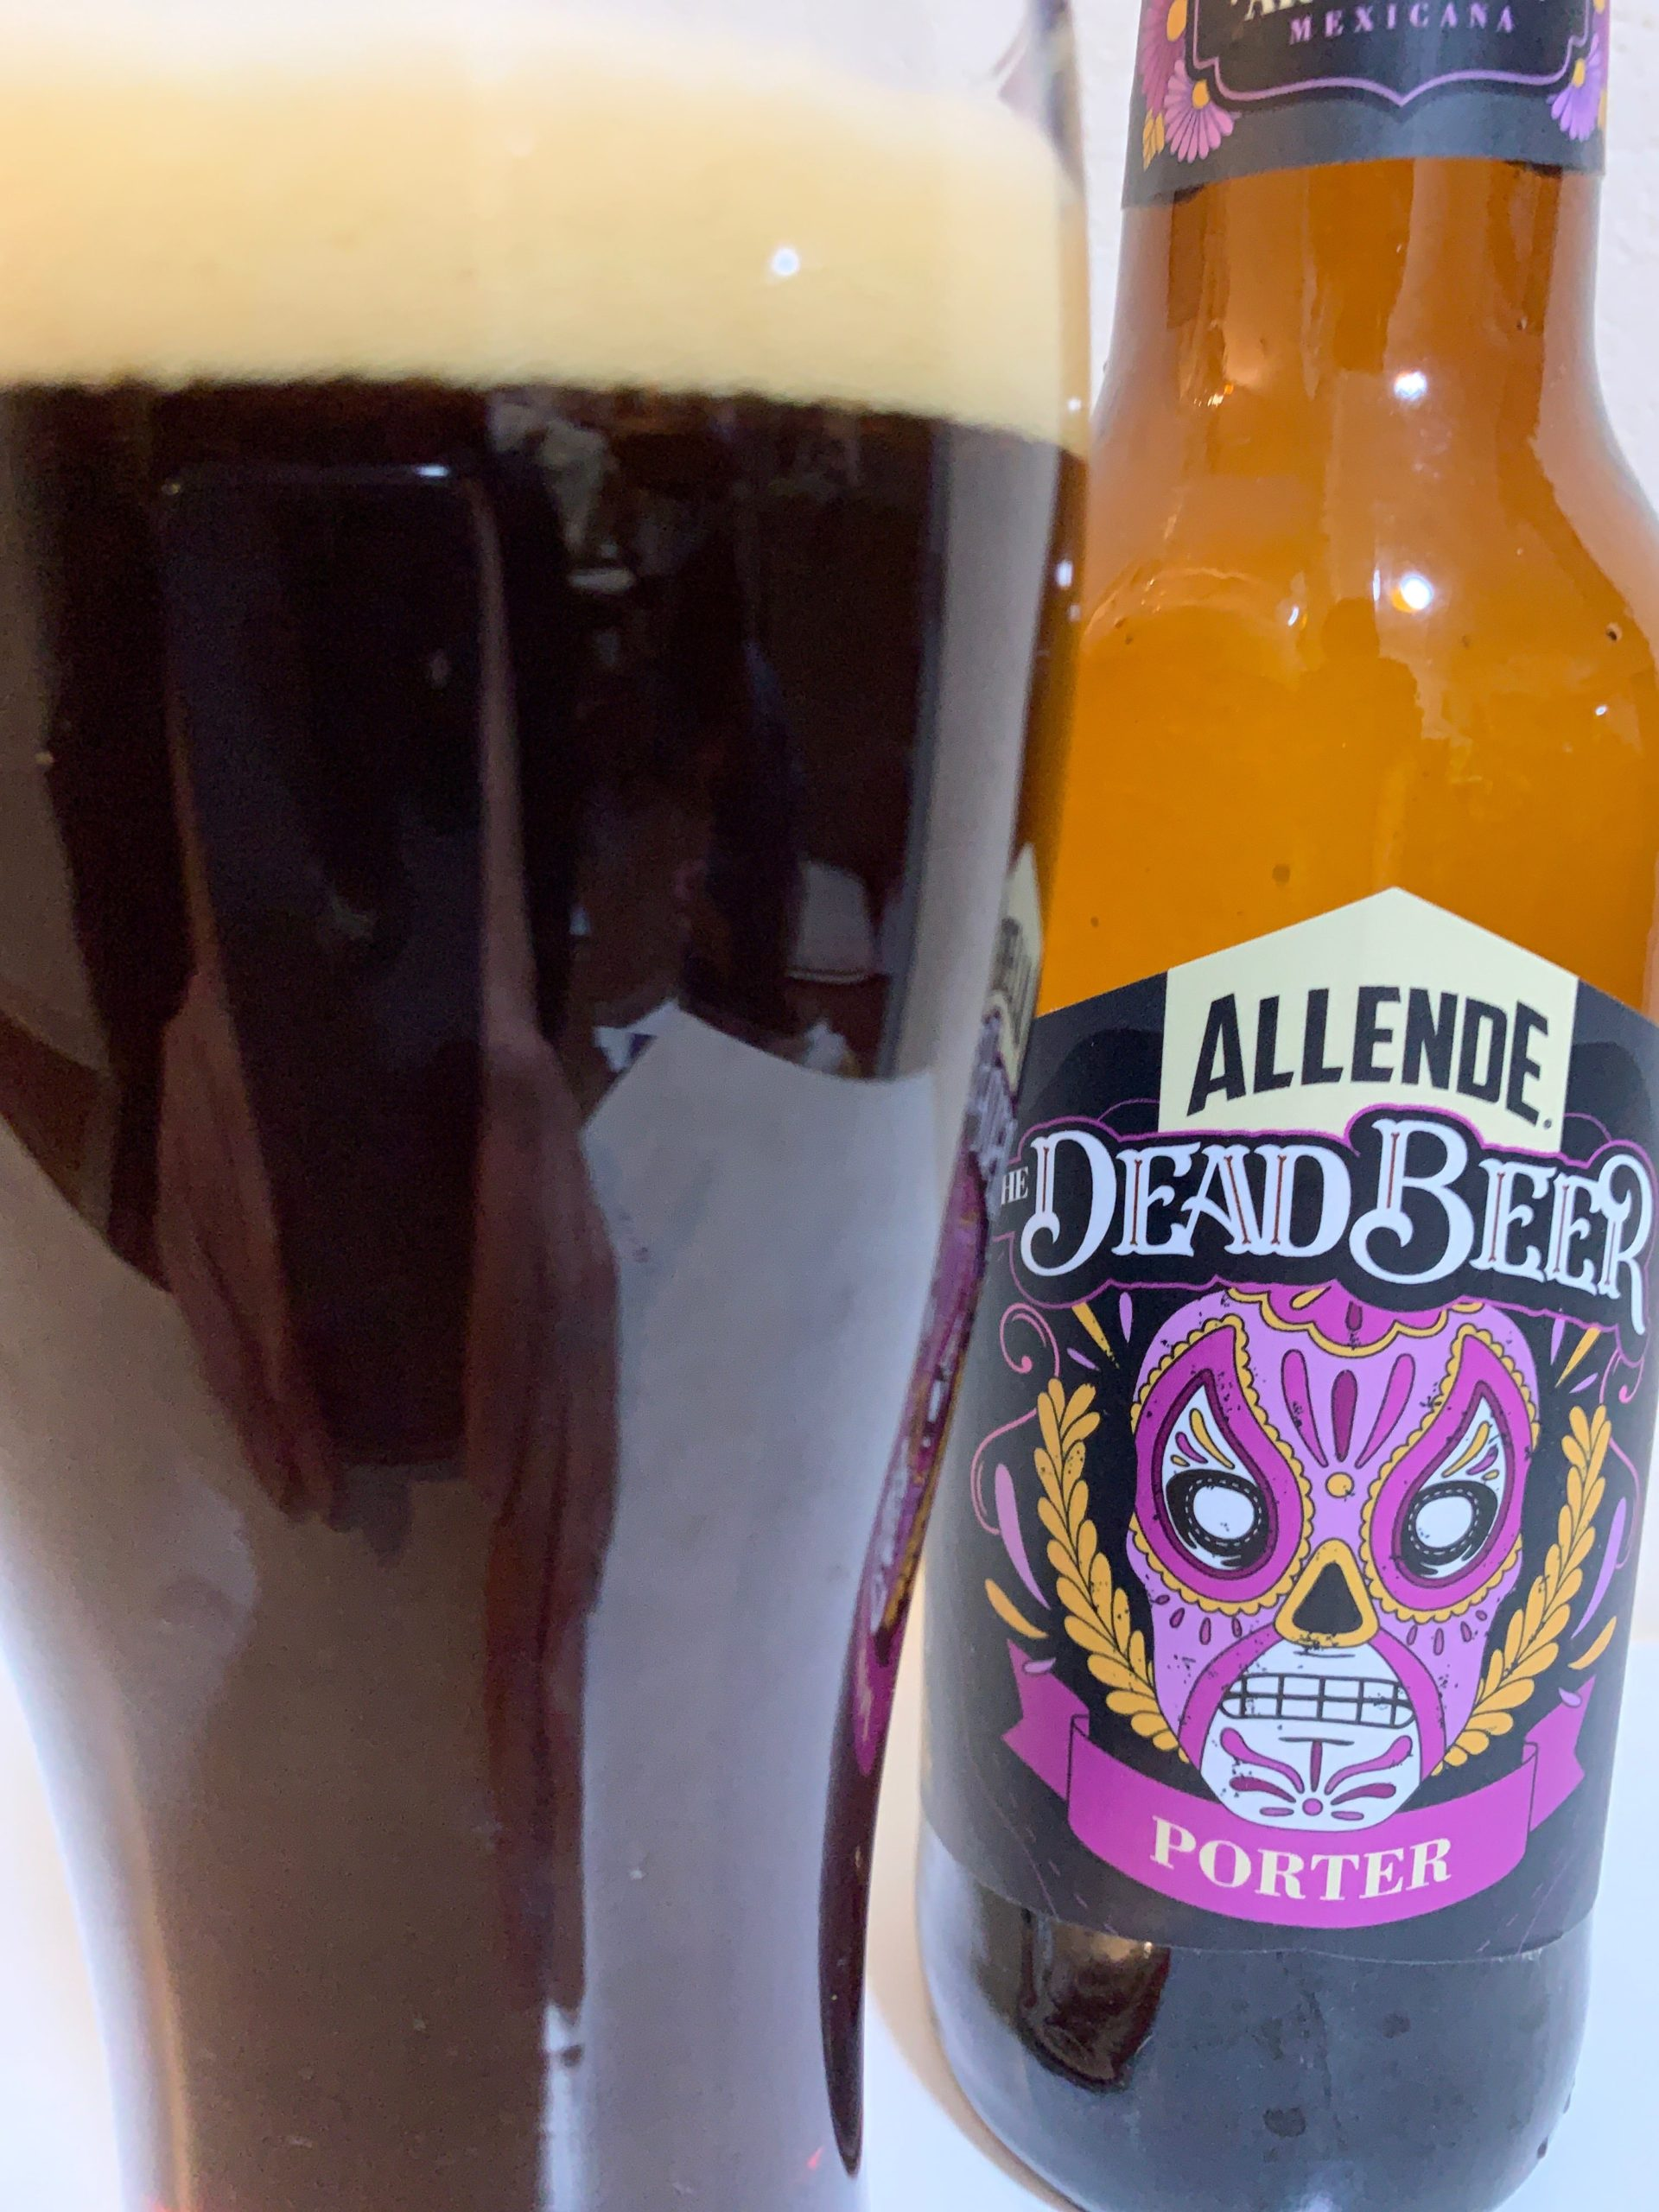 ALLENDE THE DEAD BEER PORTER(アジェンデ ザ デッドビール ポーター)